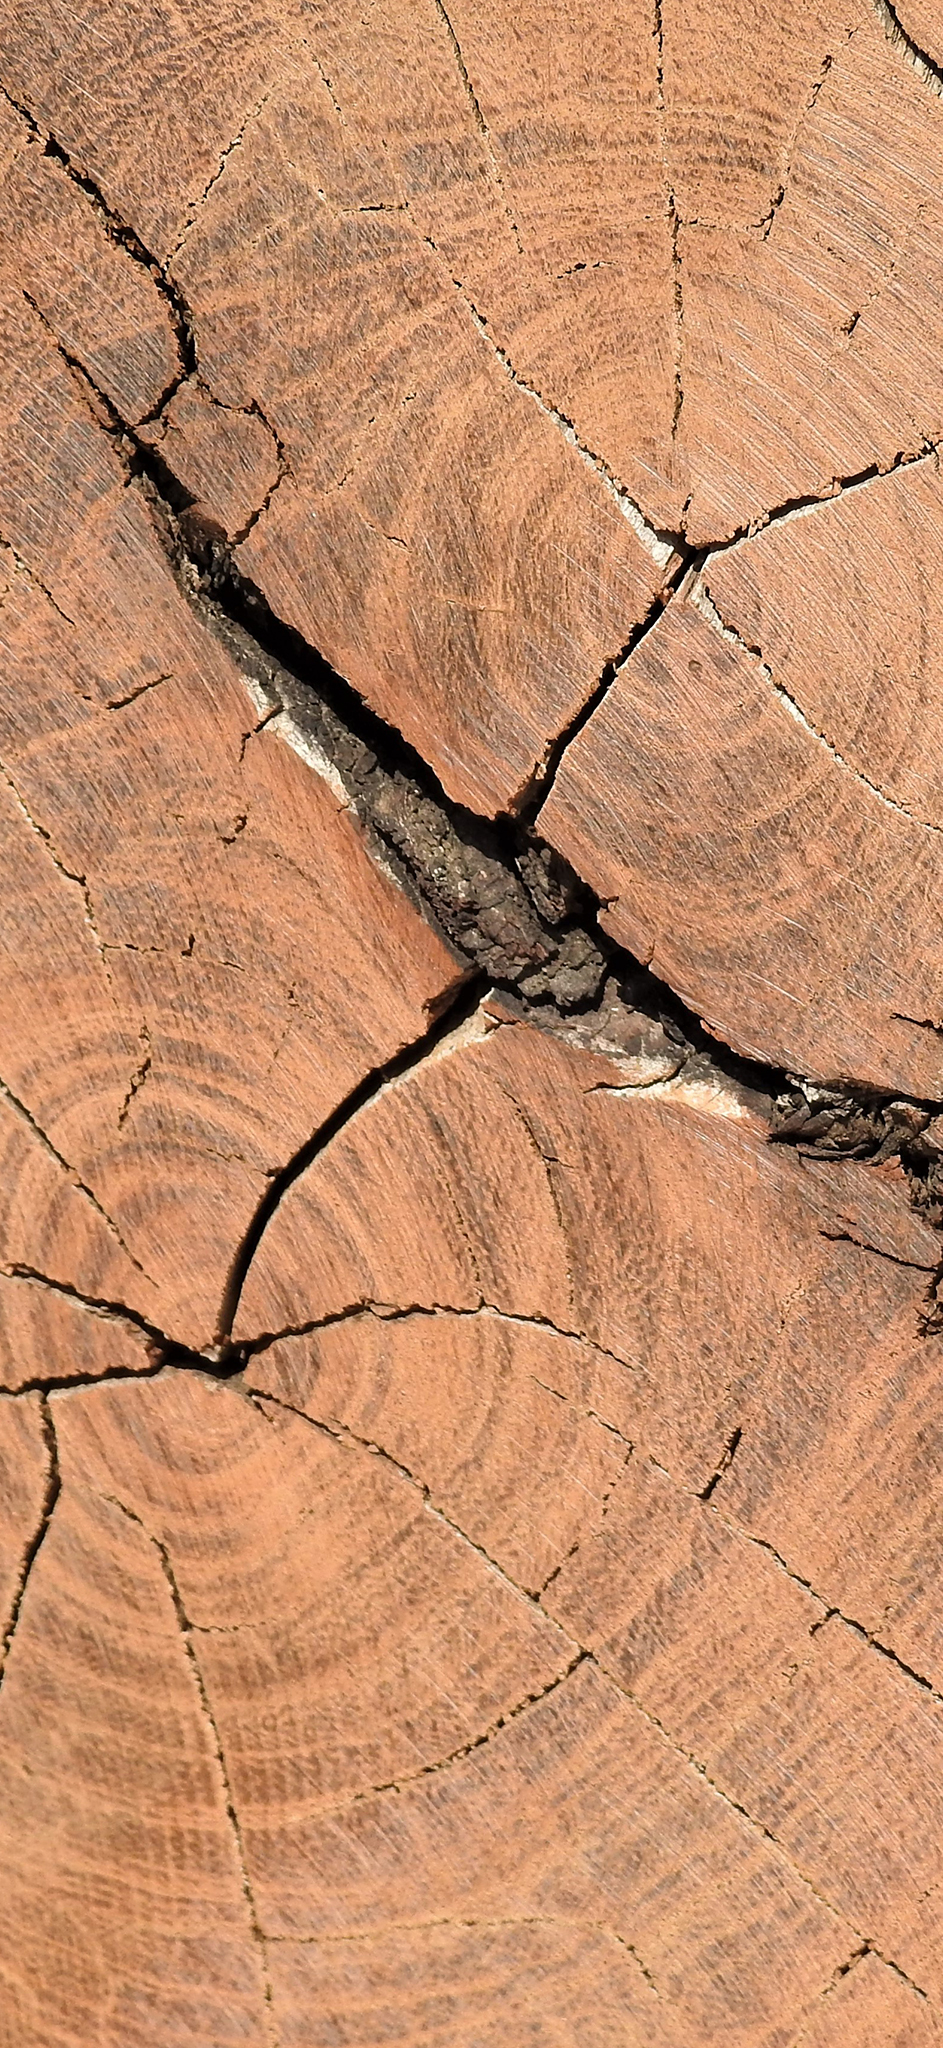 Tikoloshe-afrika-roots-wood